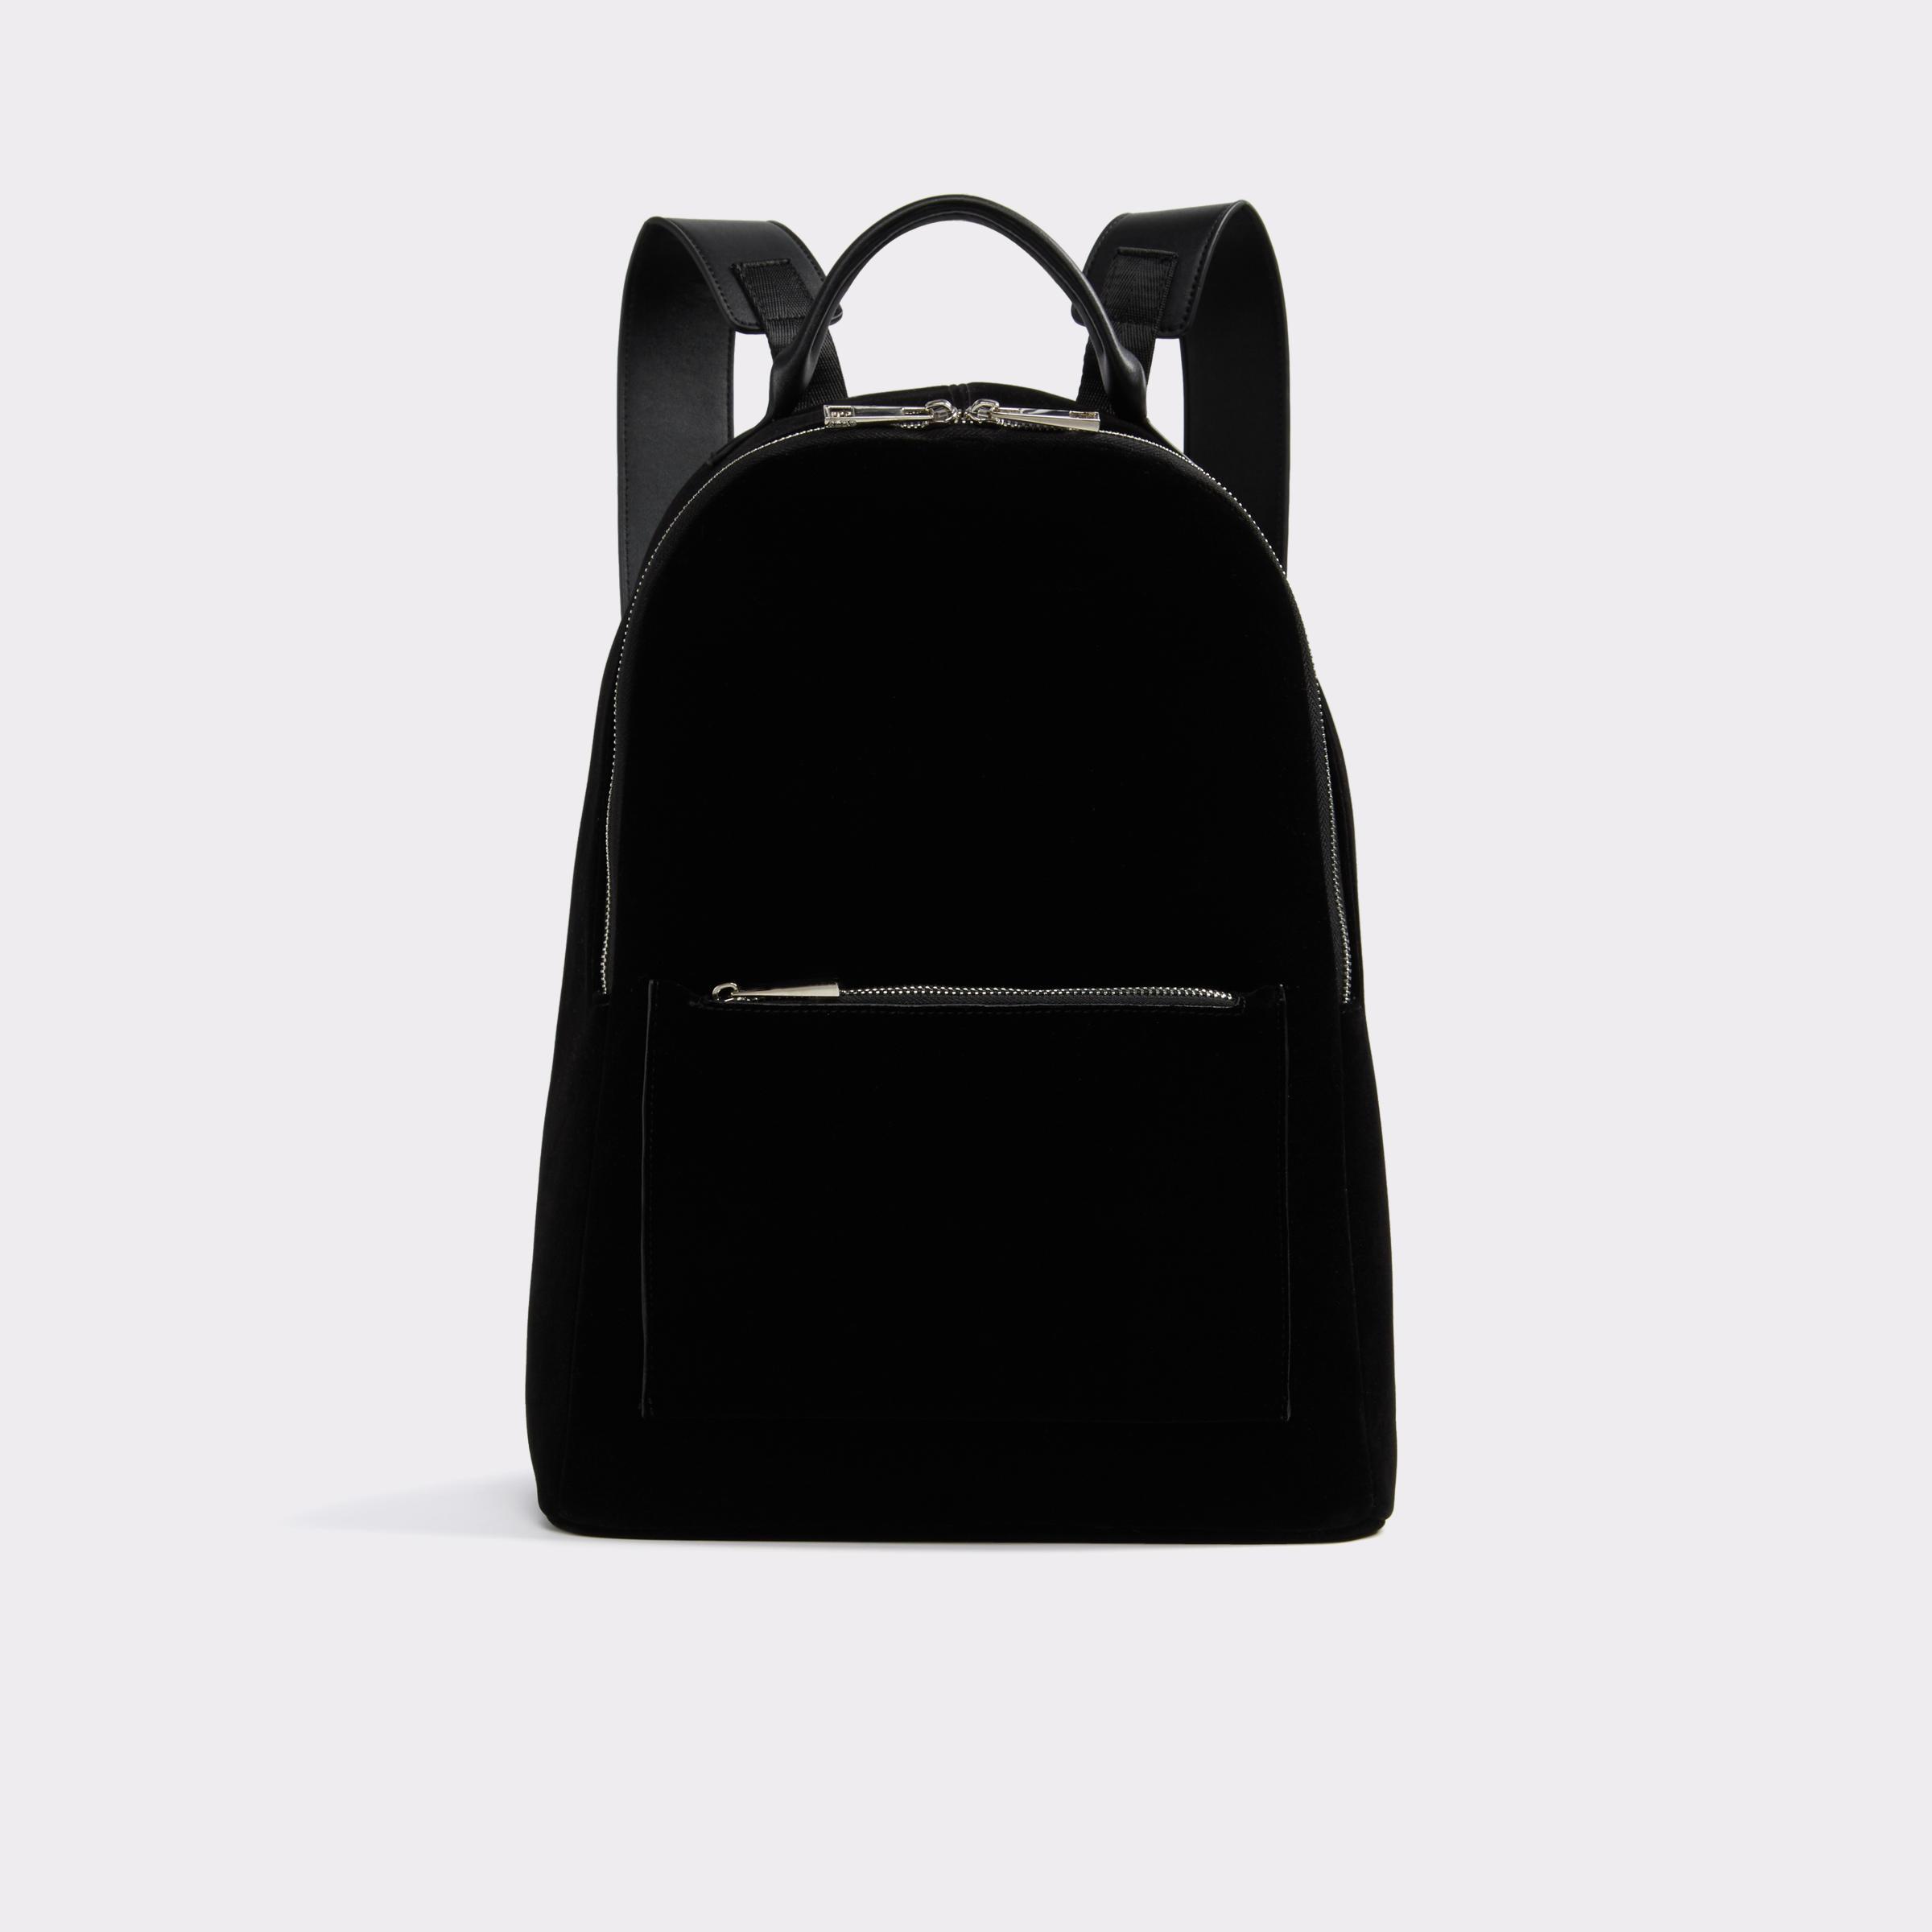 Rucsac negru, pentru barbati, ALDO - Decos97, din material textil